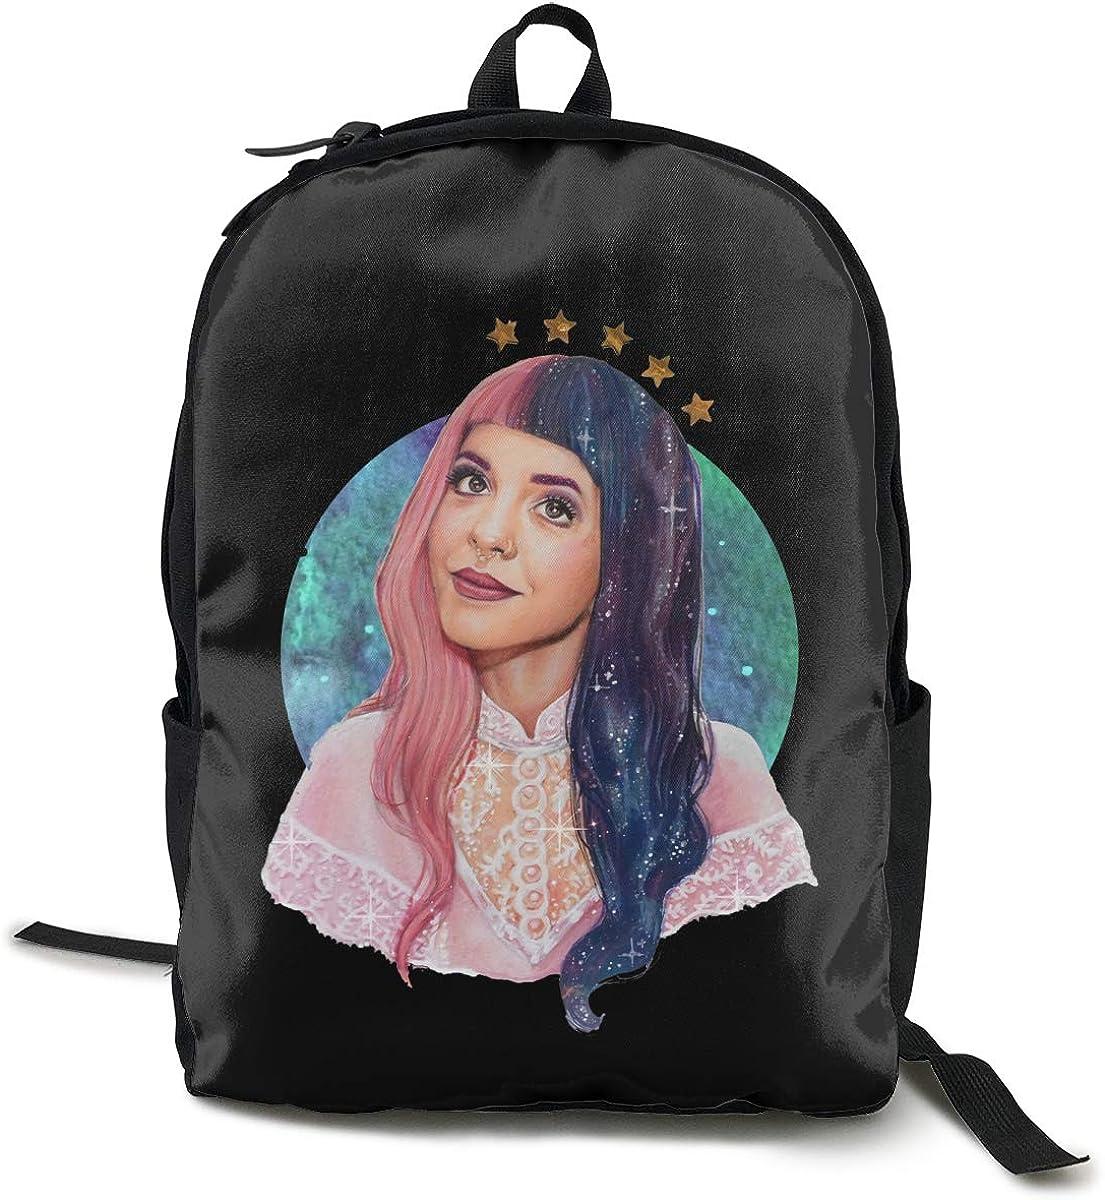 N / A Mochila clásica Melanie Martinez Cry Baby Pack, mochila escolar, bolsa negra, viaje de trabajo, poliéster, unisex, escuela